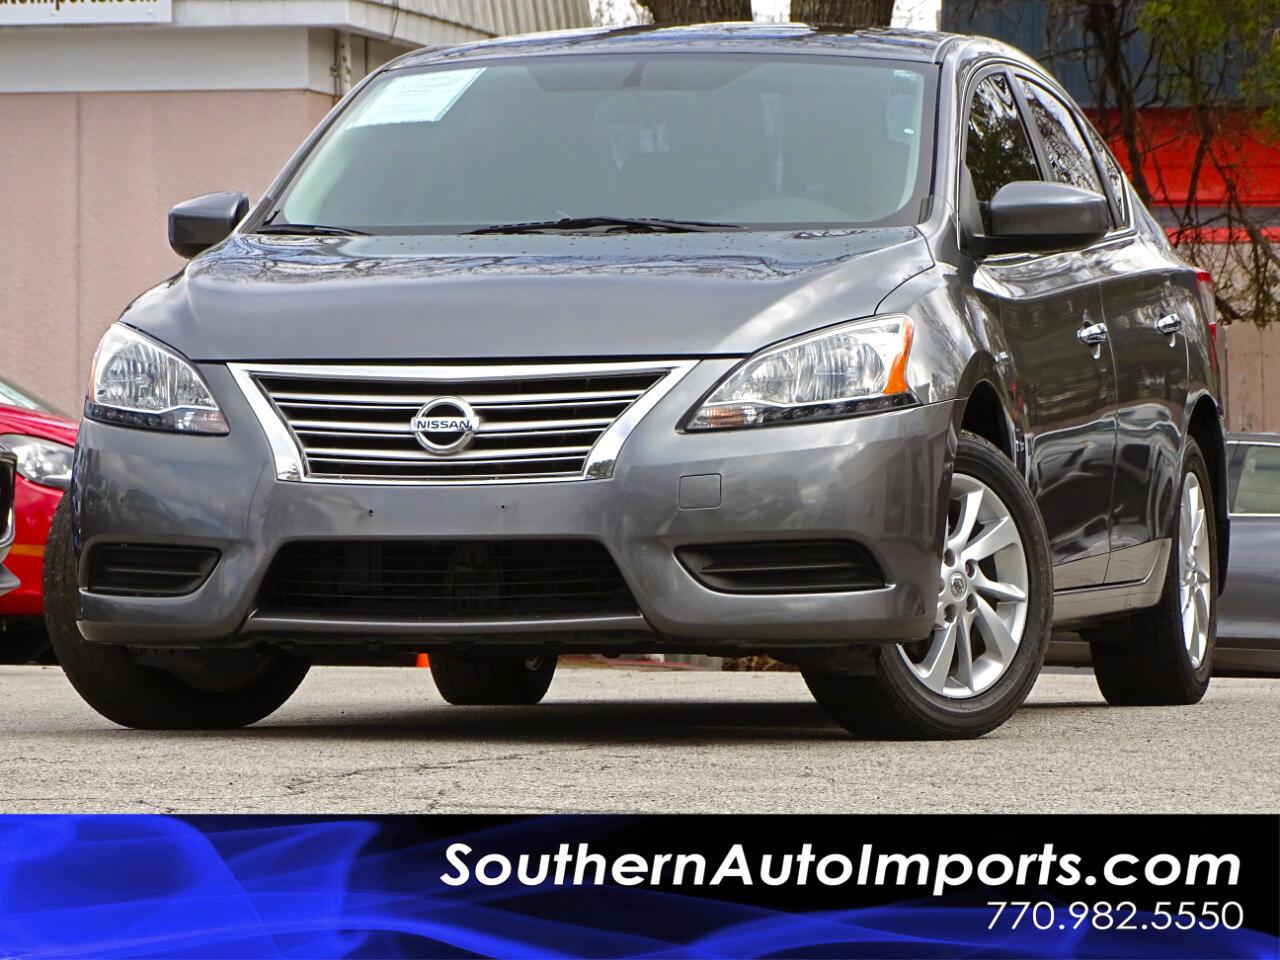 2015 Nissan Sentra SV w/Alloy Wheels Sunroof